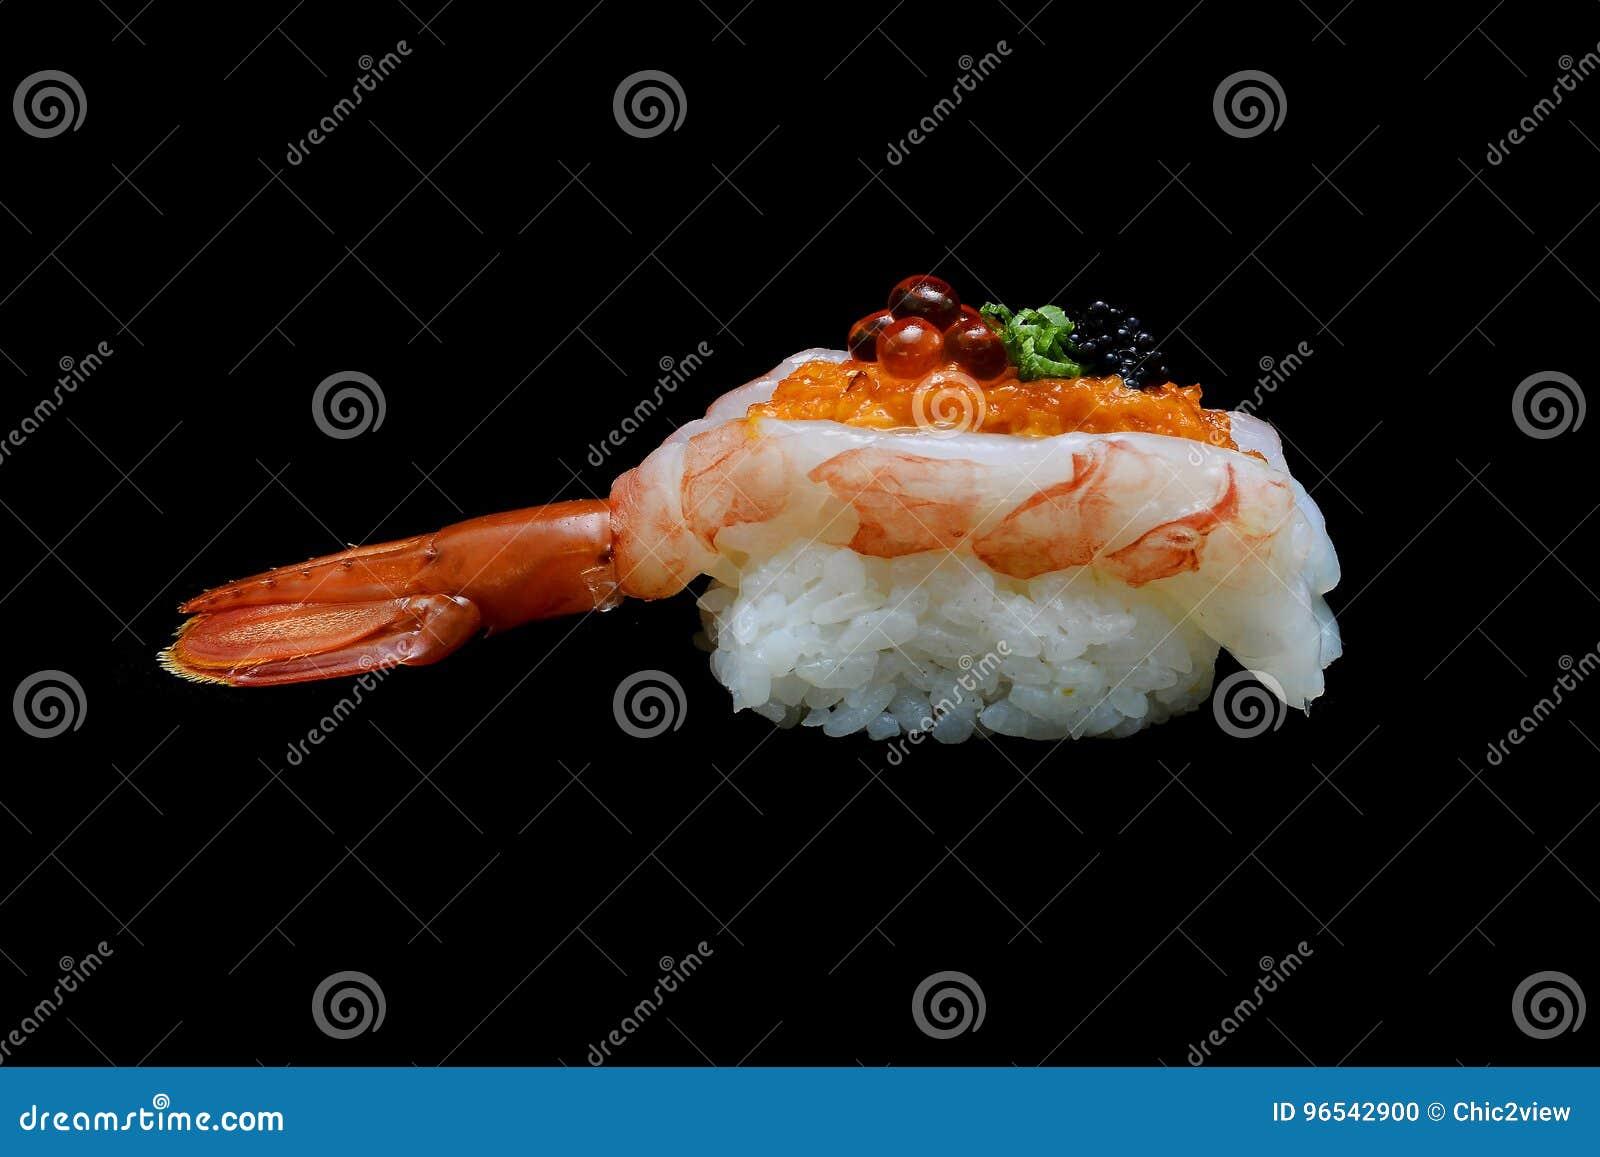 Botan Ebi Sushi Or Spacial Premium King Shrimp Sushi Mixed By Ikura